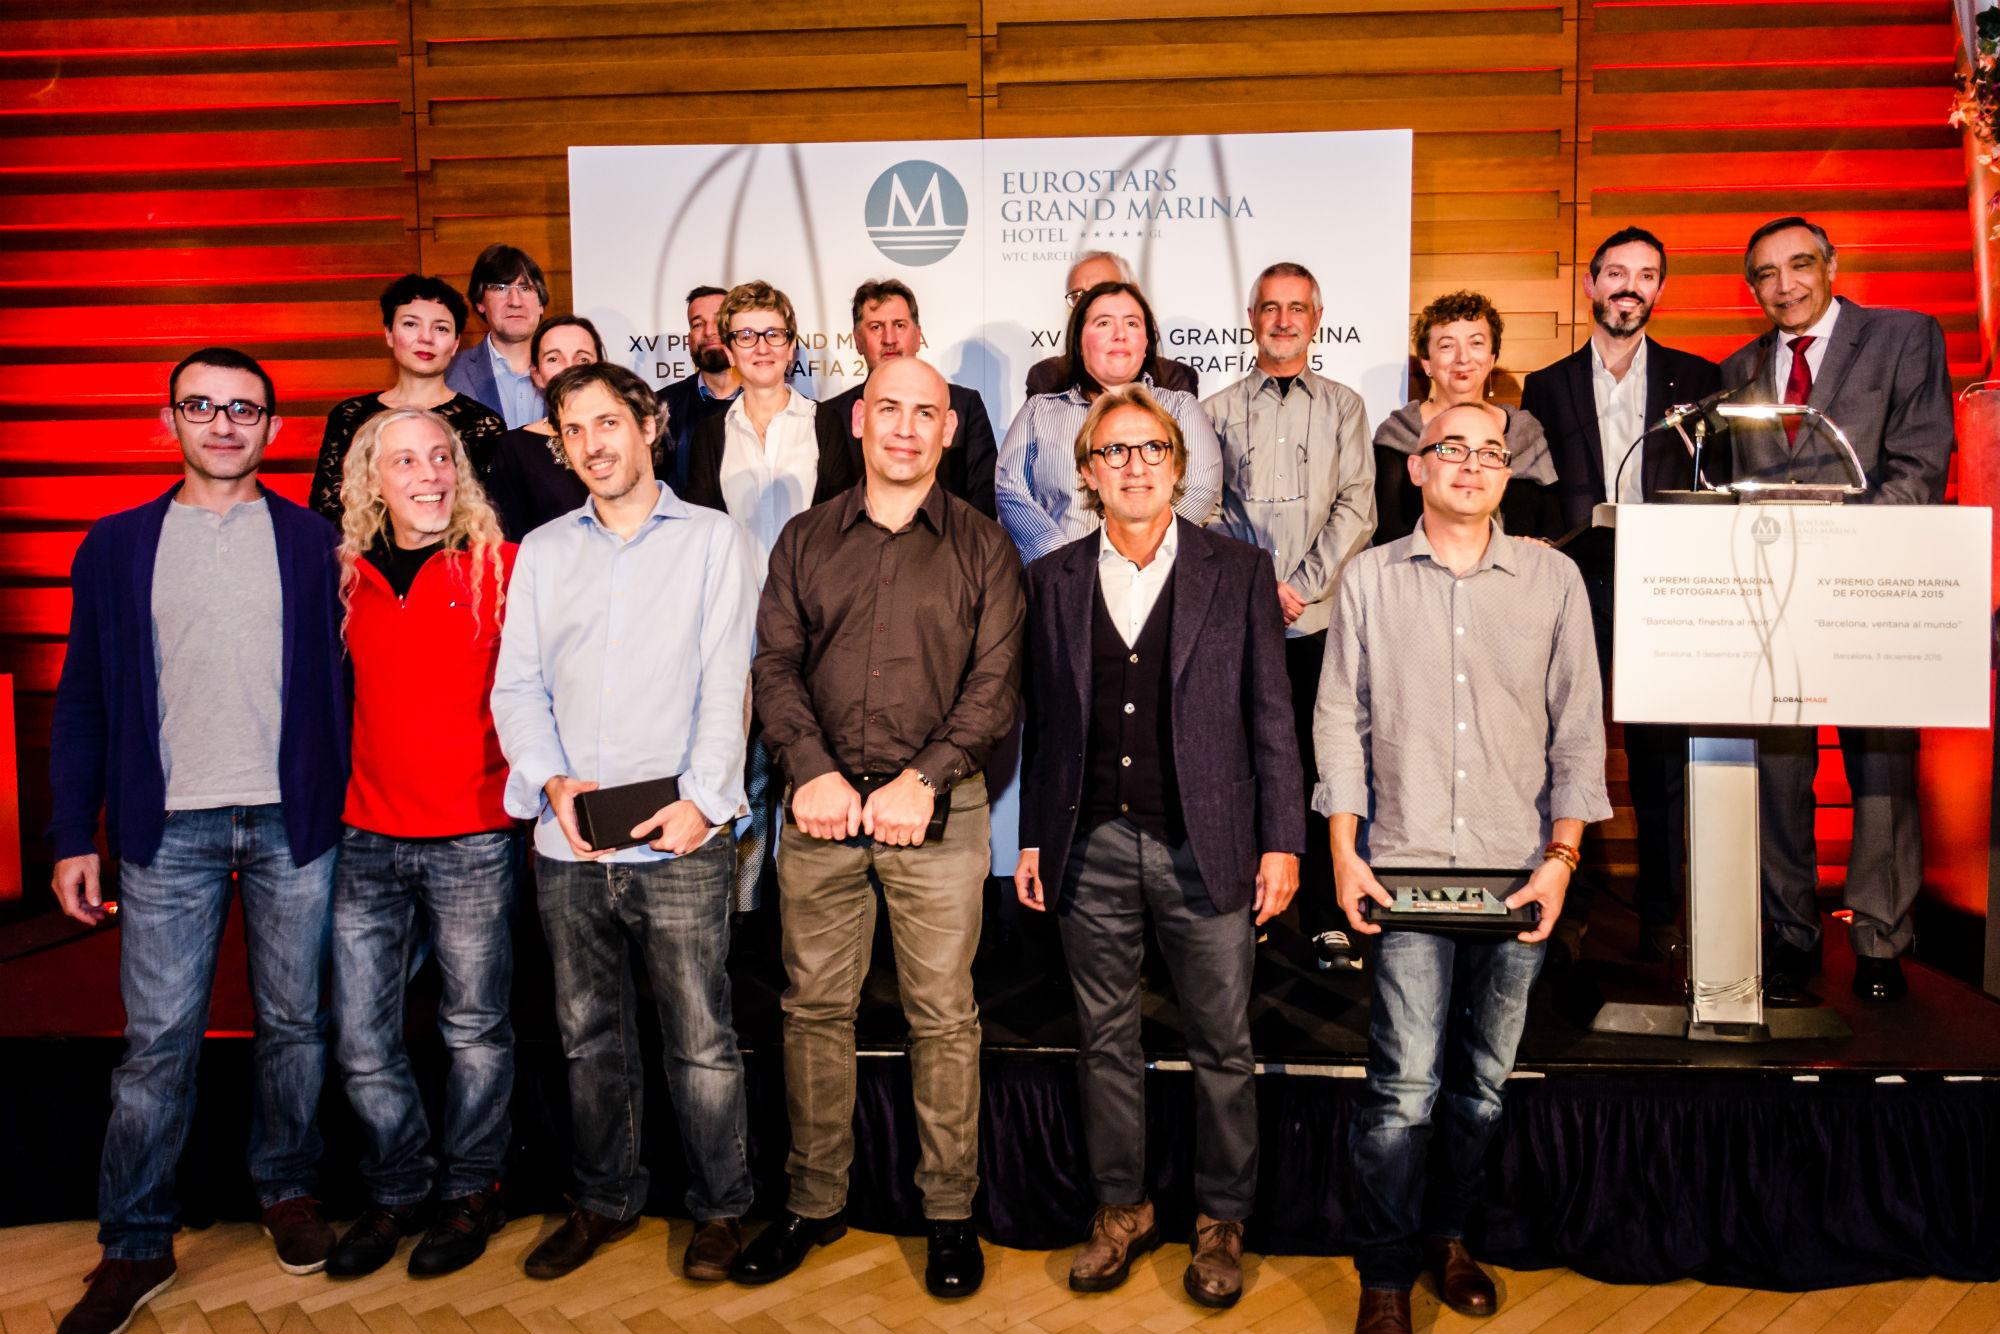 Ganadores del XV Premio Eurostars Grand Marina